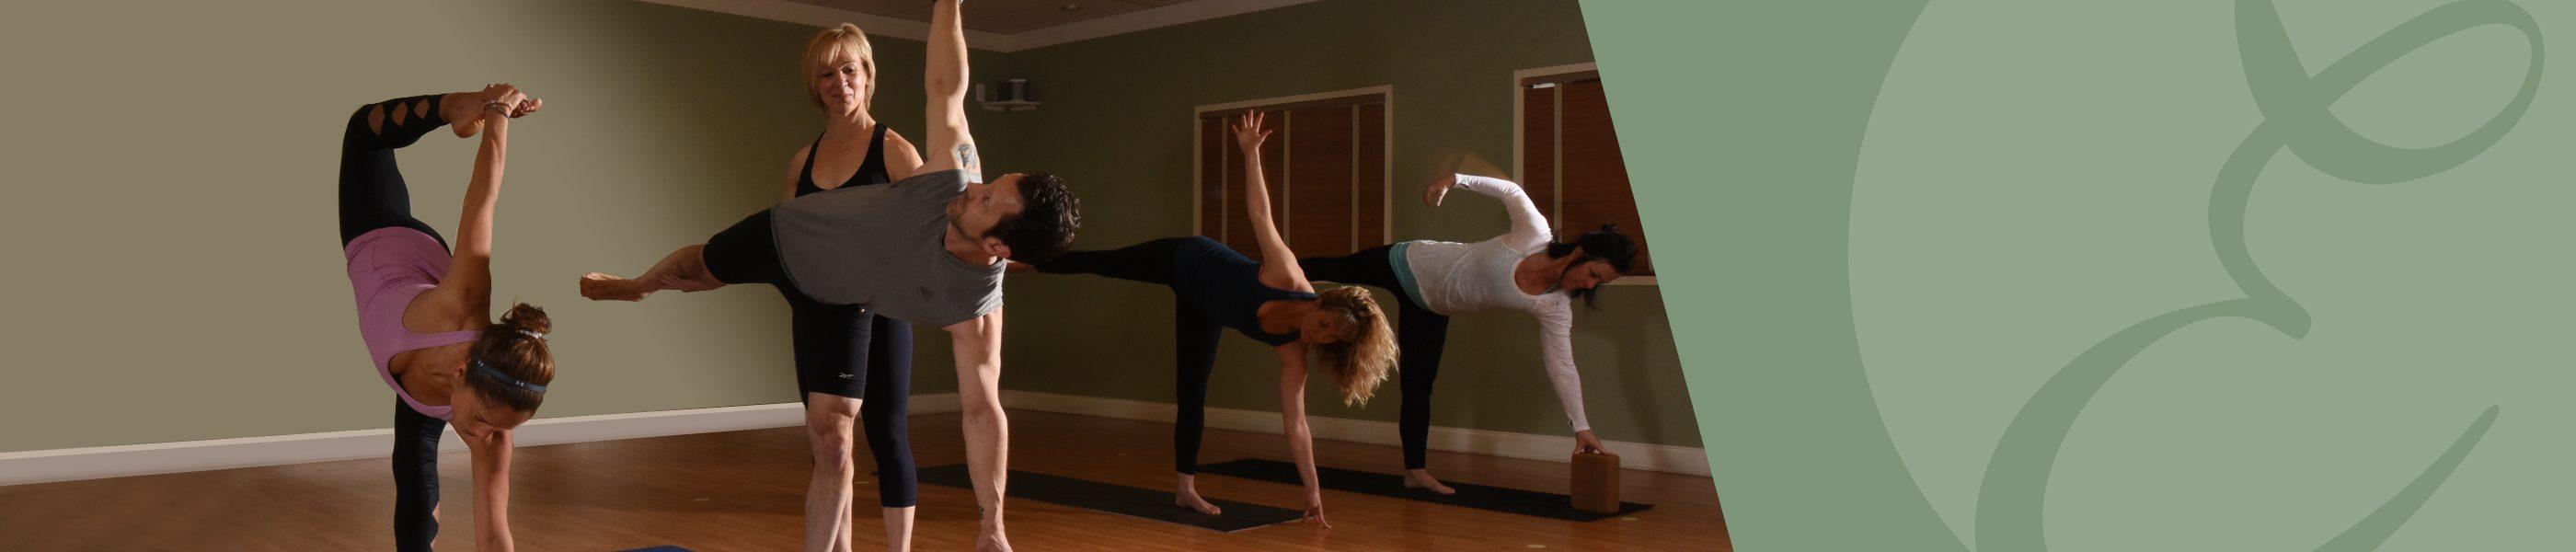 Advanced Yoga Teacher Training At Evolutions Annapolis Health Club